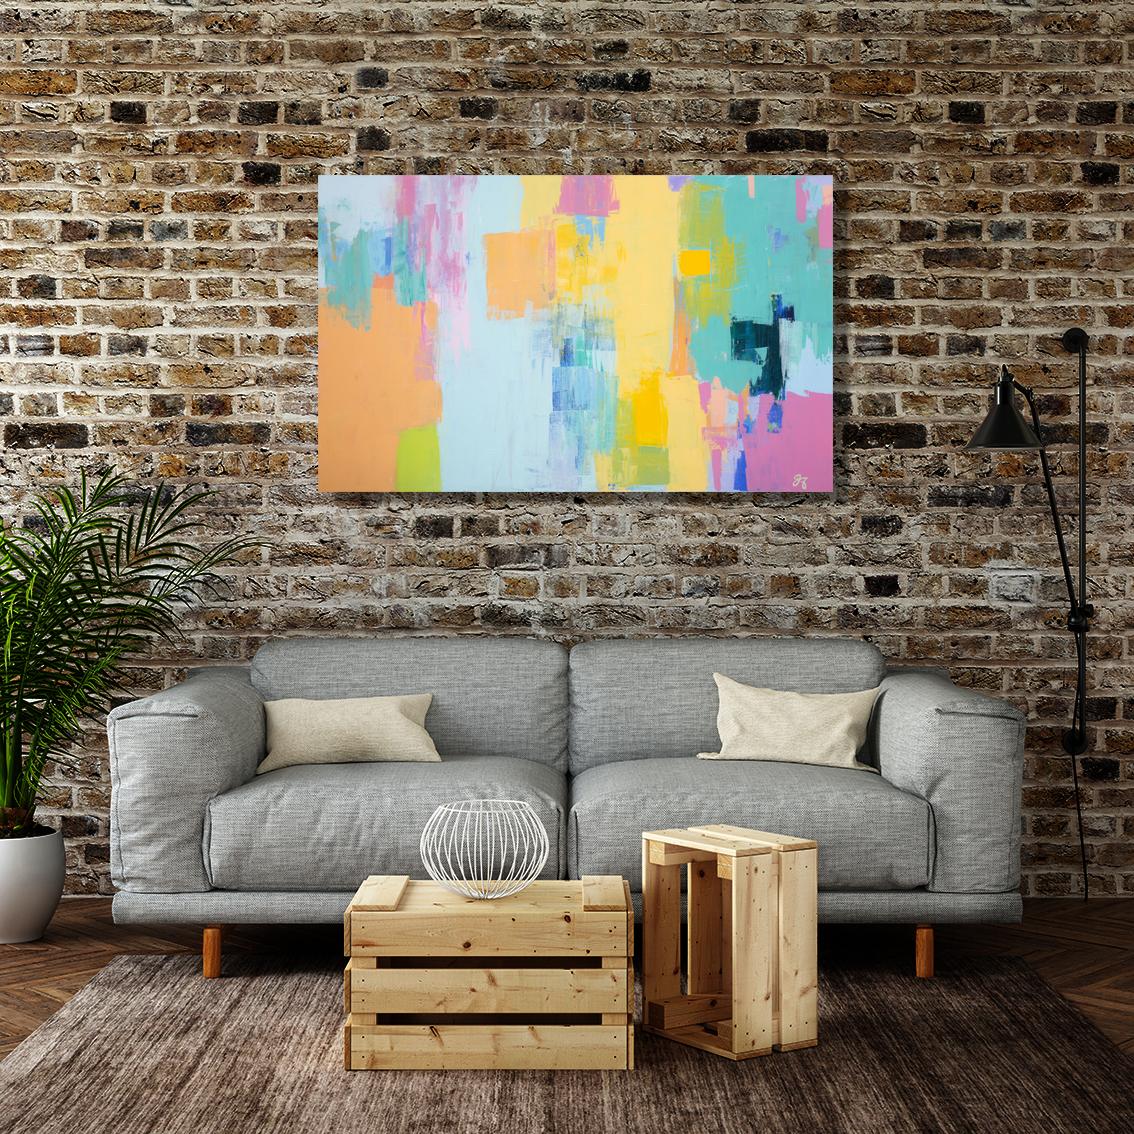 Light up the room - with Jasmine Aras Original ART